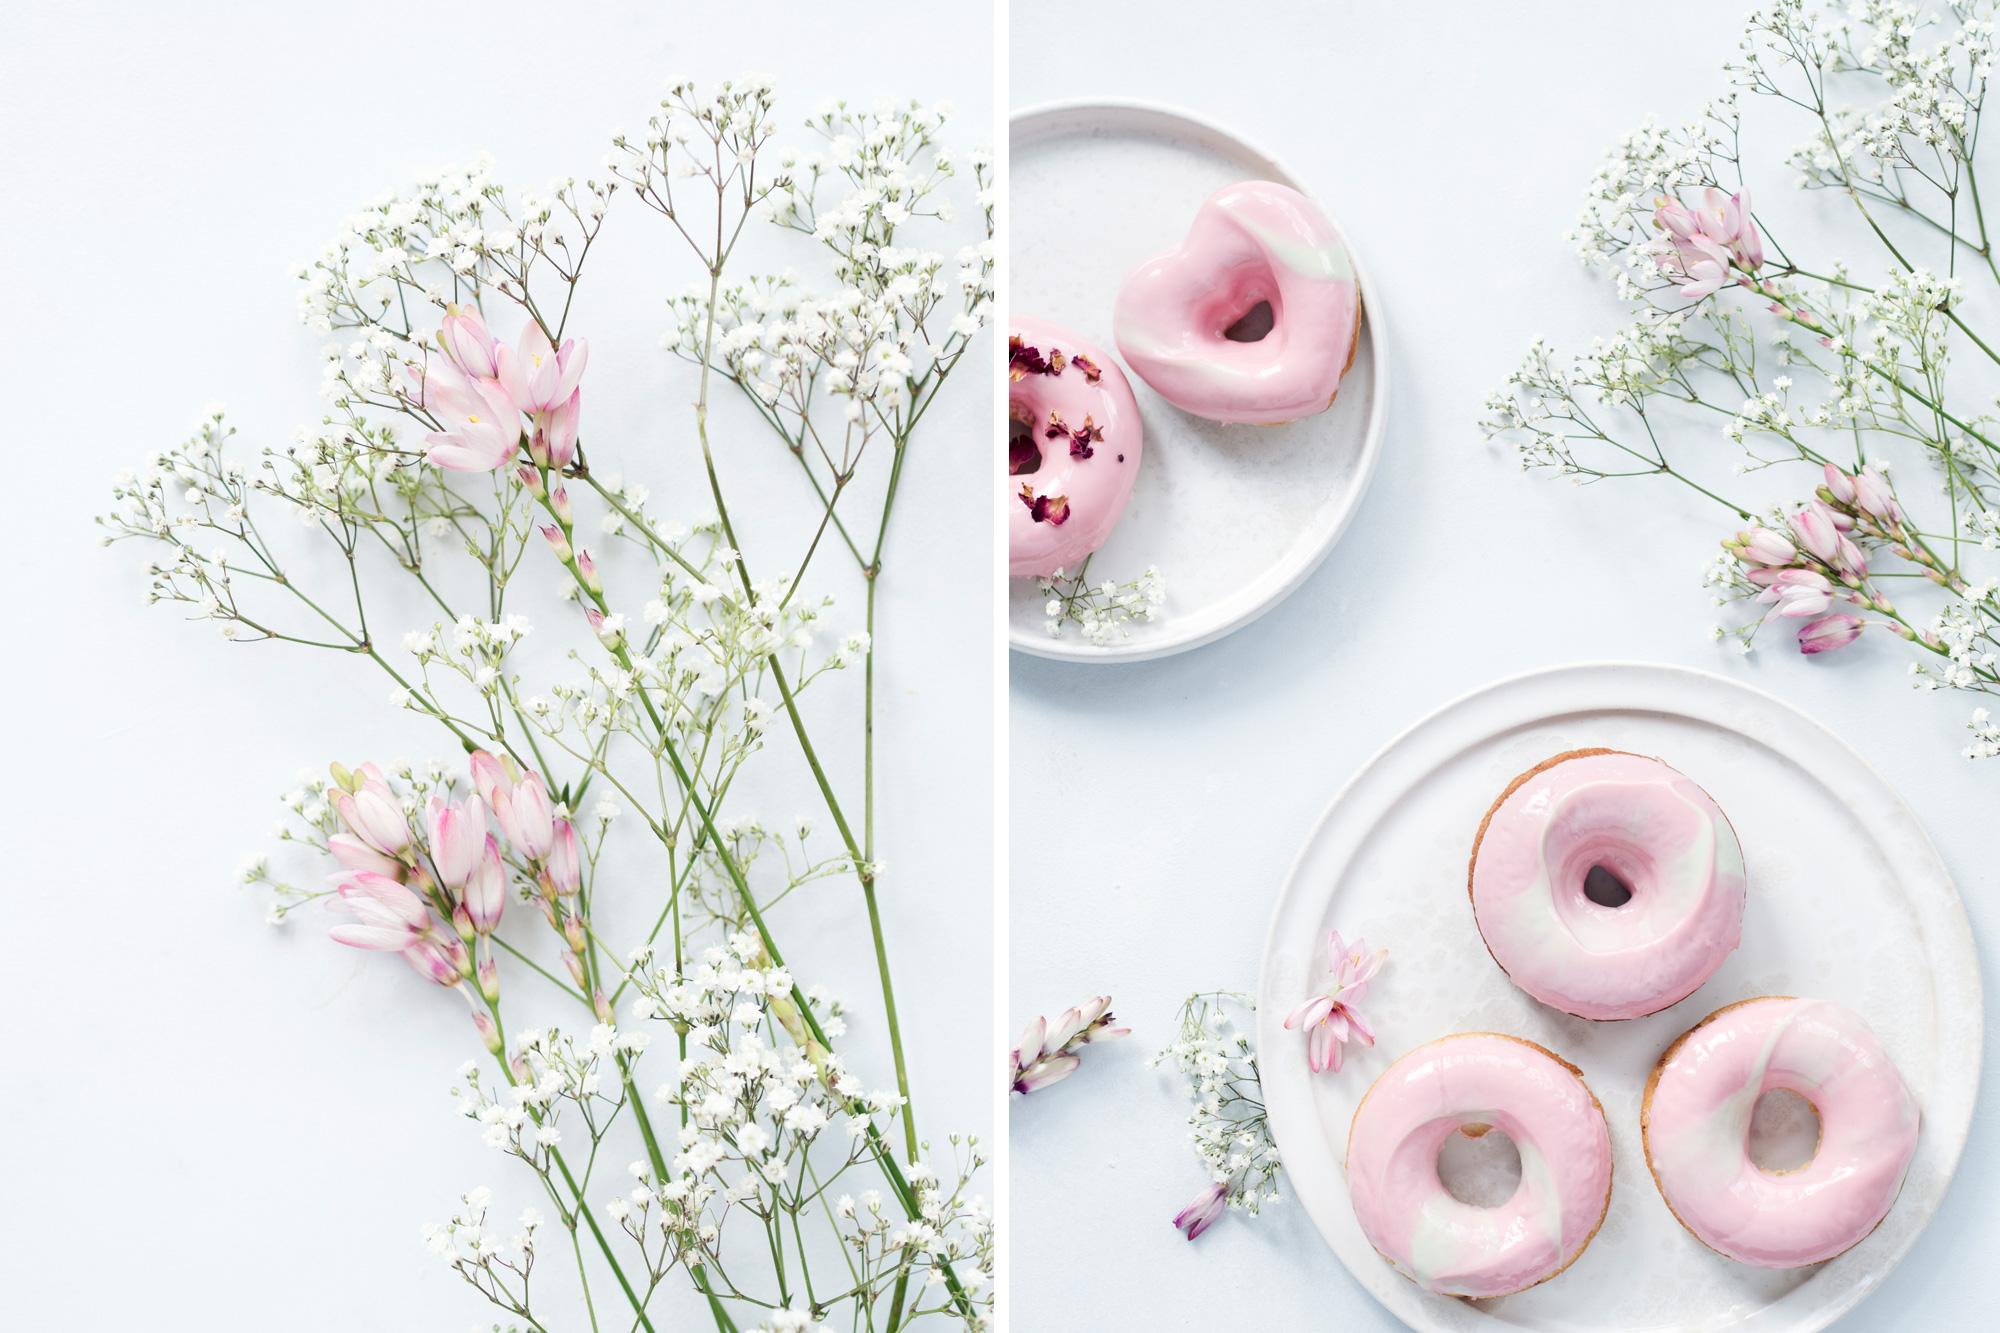 Copenhagencakes-jordbaer-doughnuts-donuts-4